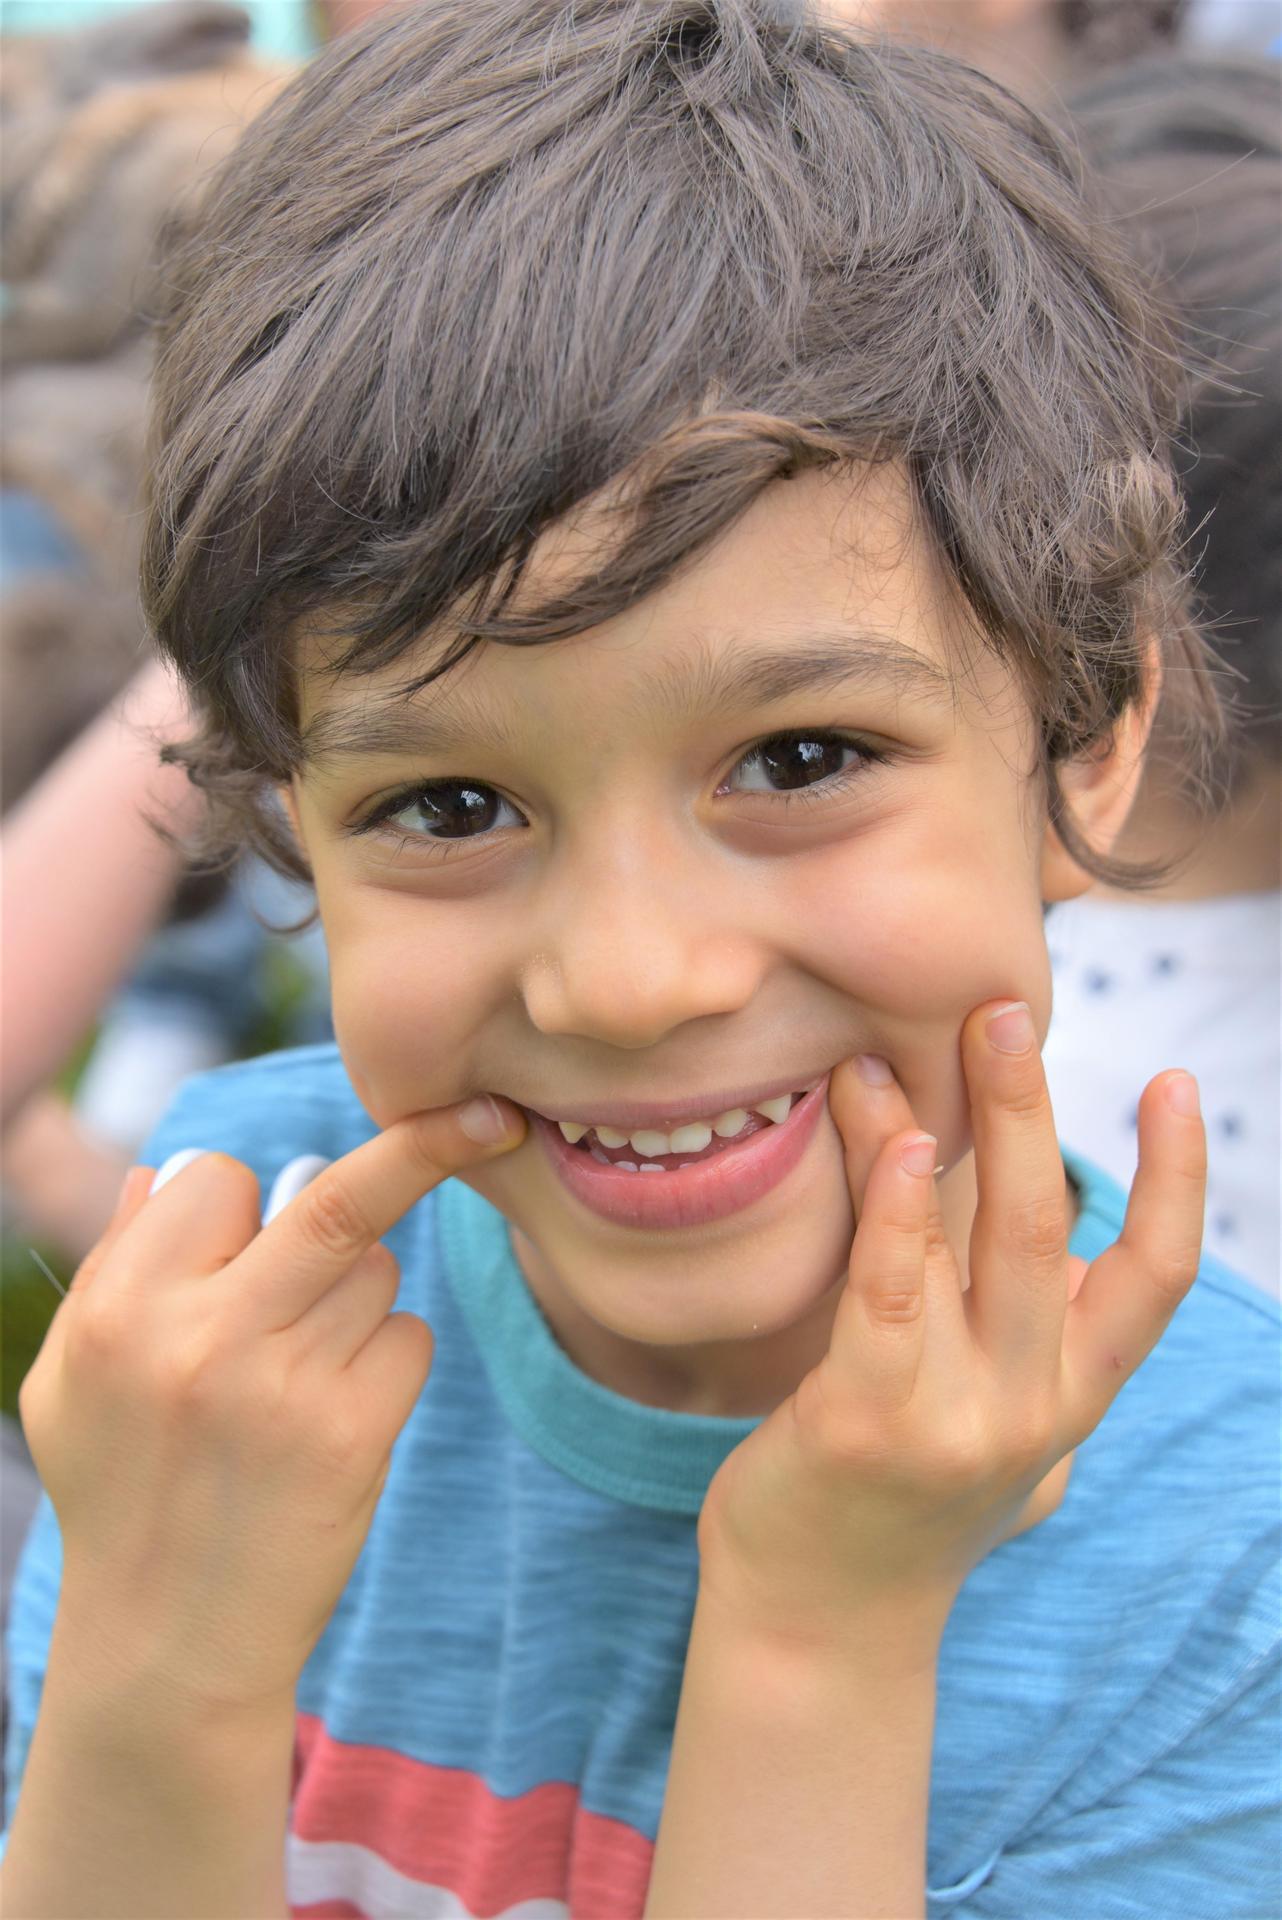 A boy comes close to a camera and smiles.